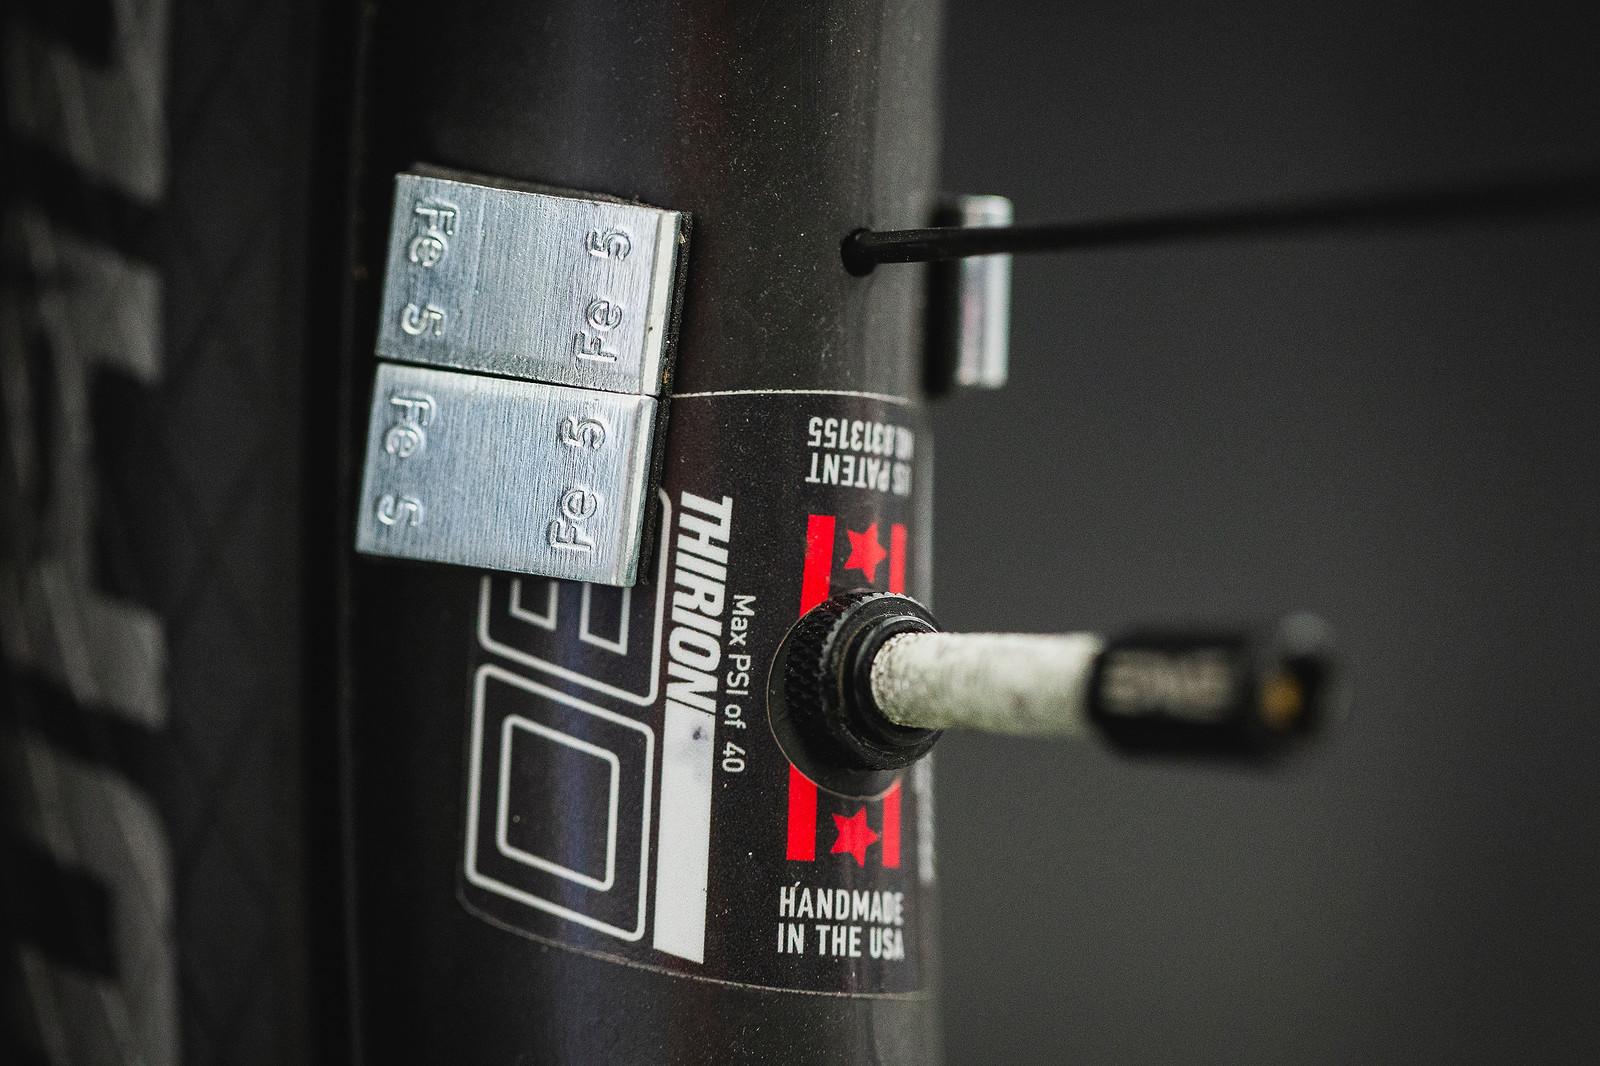 PIT BITS - Val di Sole 2019 World Cup Downhill Bike Tech - PIT BITS - 2019 Val di Sole World Cup Downhill Bike Tech - Mountain Biking Pictures - Vital MTB